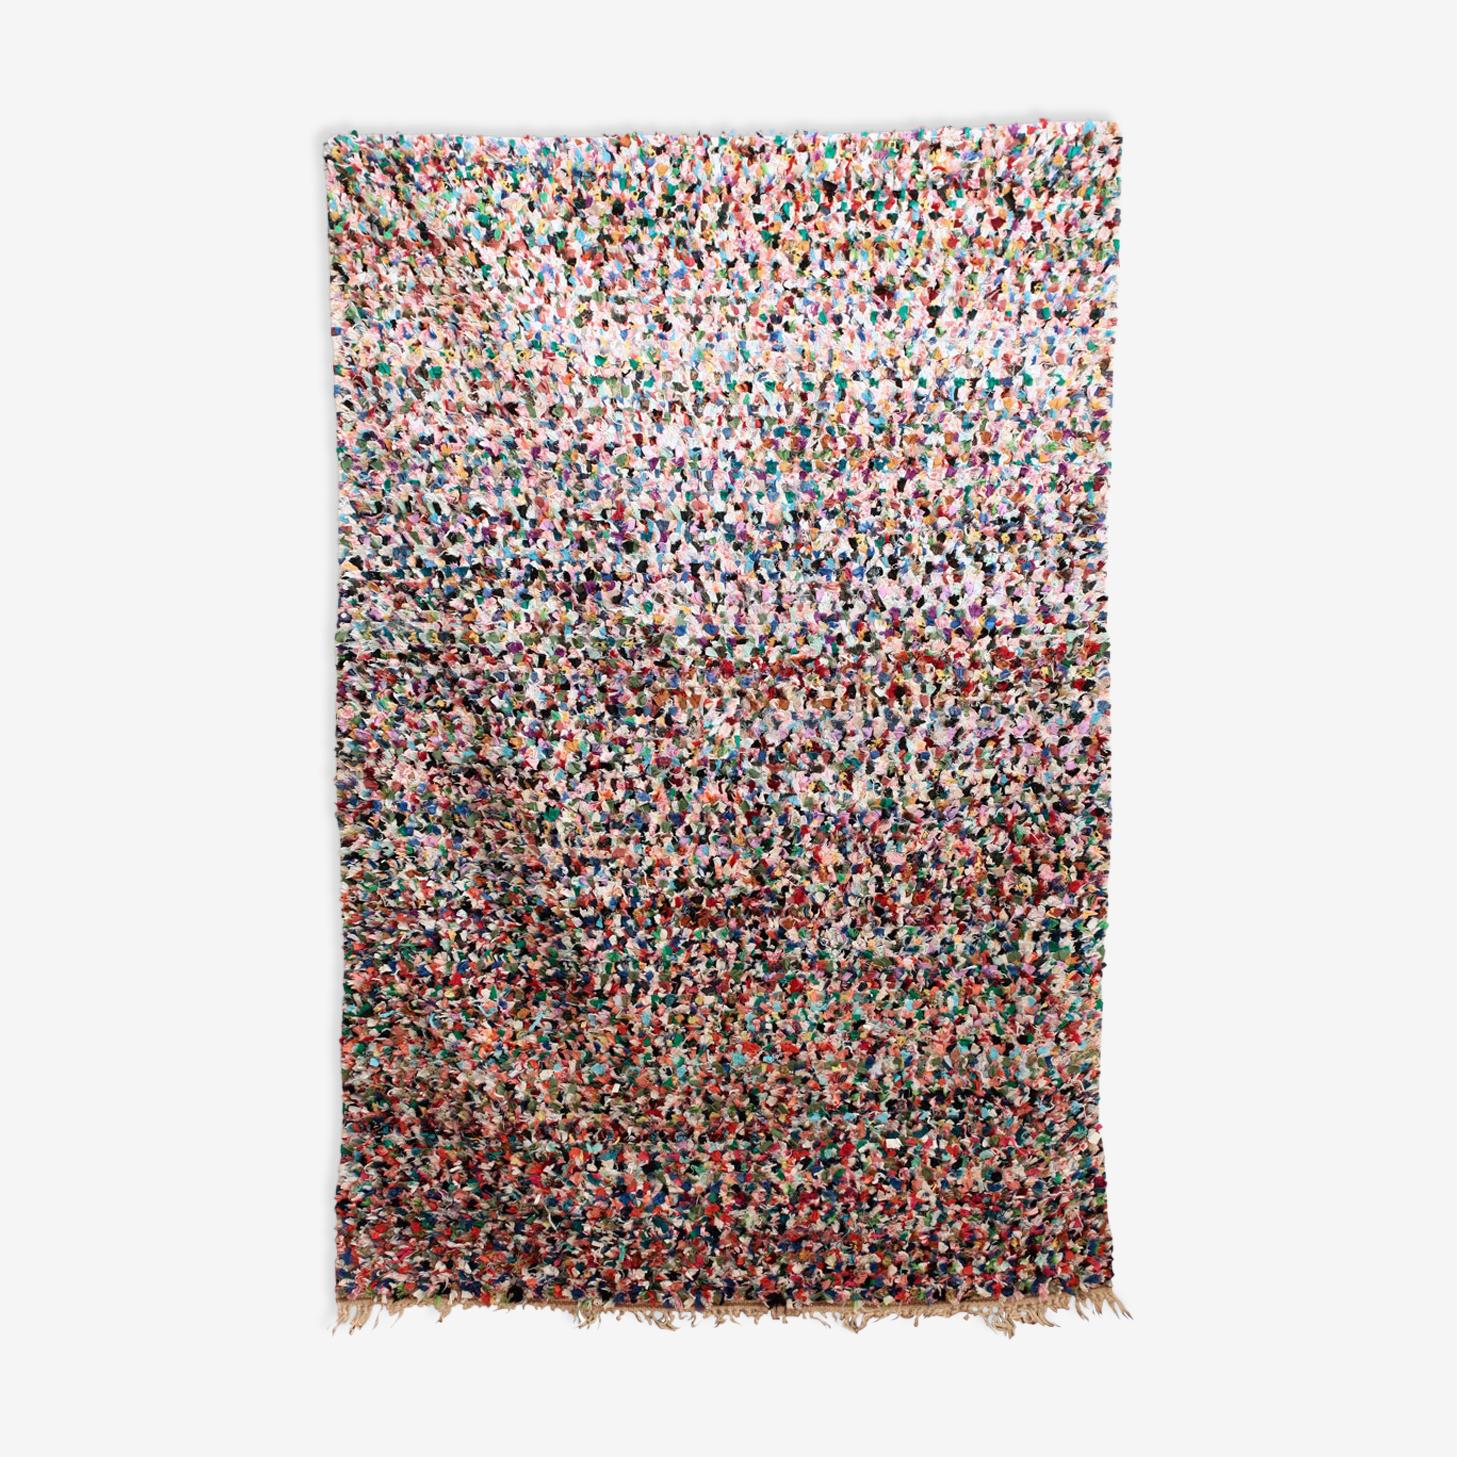 Tapis Marocain Boucherouite Multicolore 120x200cm Wool Cotton